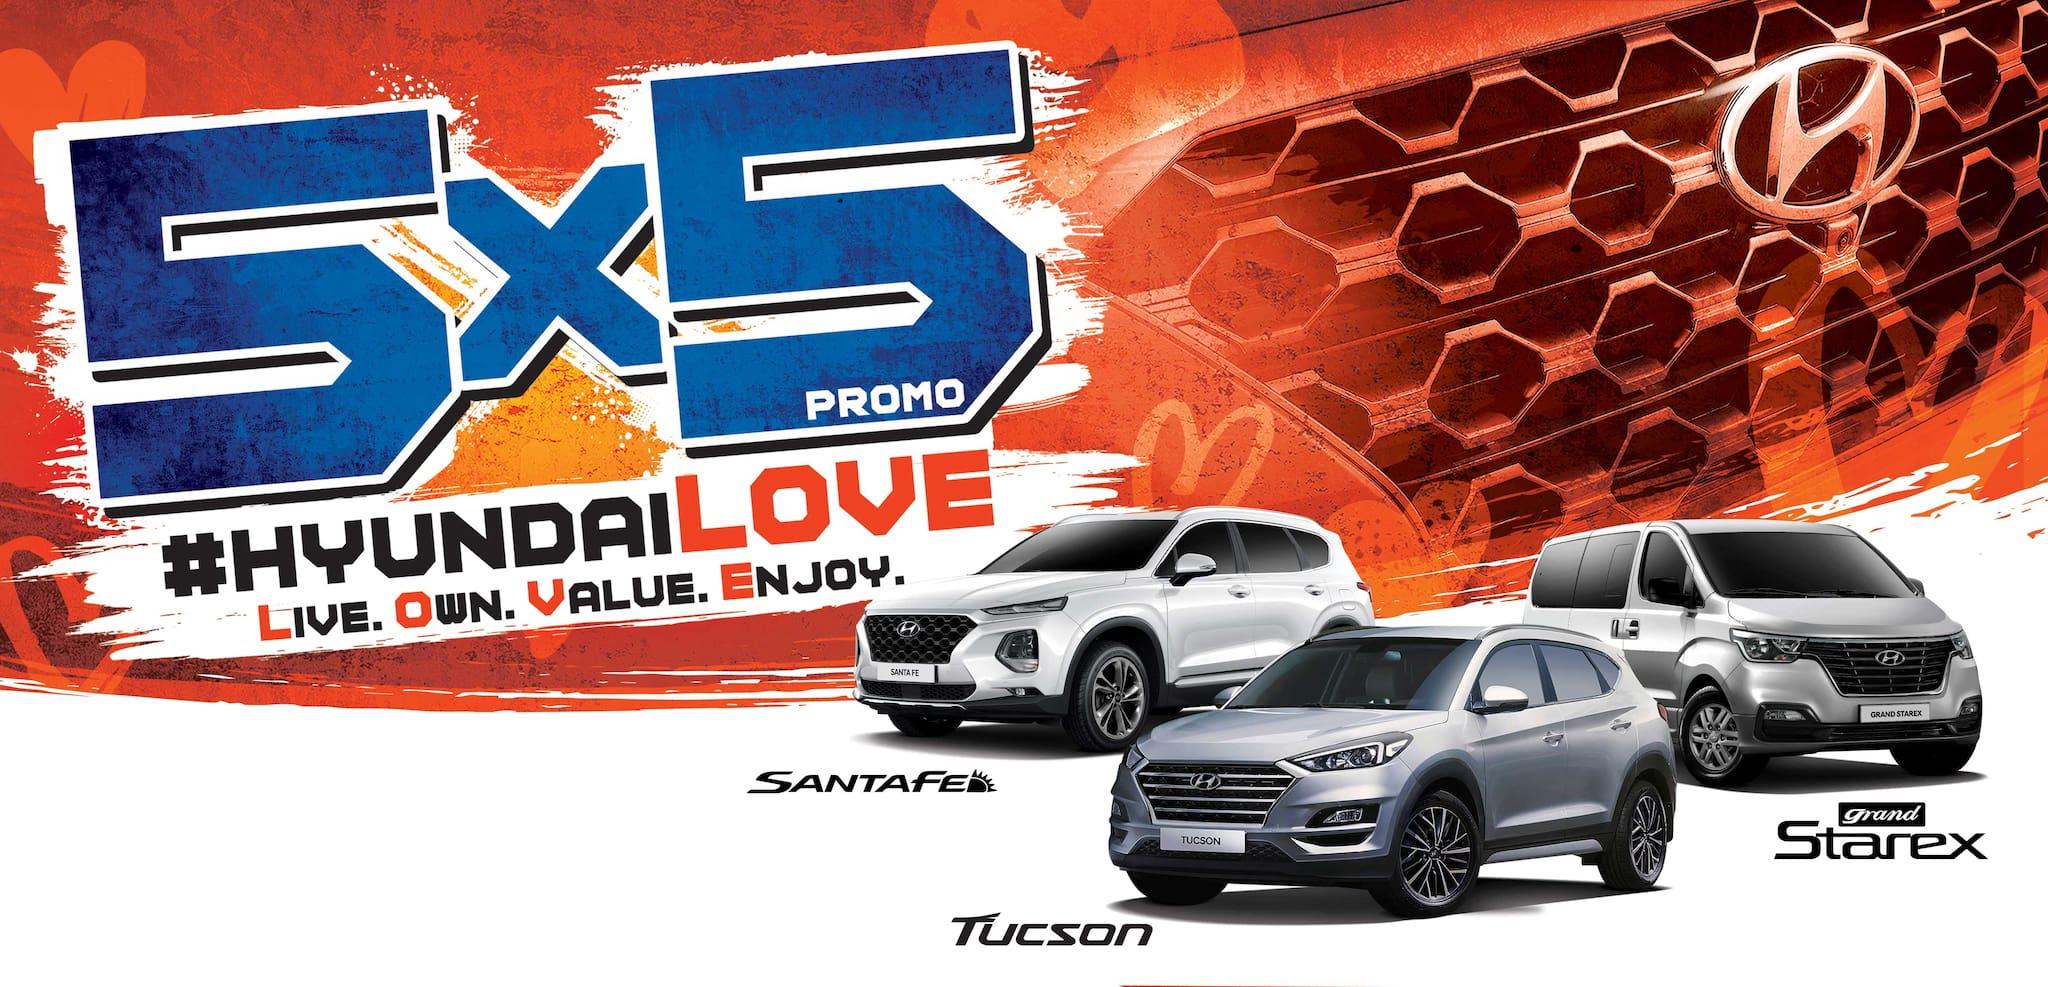 Hyundai PH Relaunches 5x5 Promo This Love Month